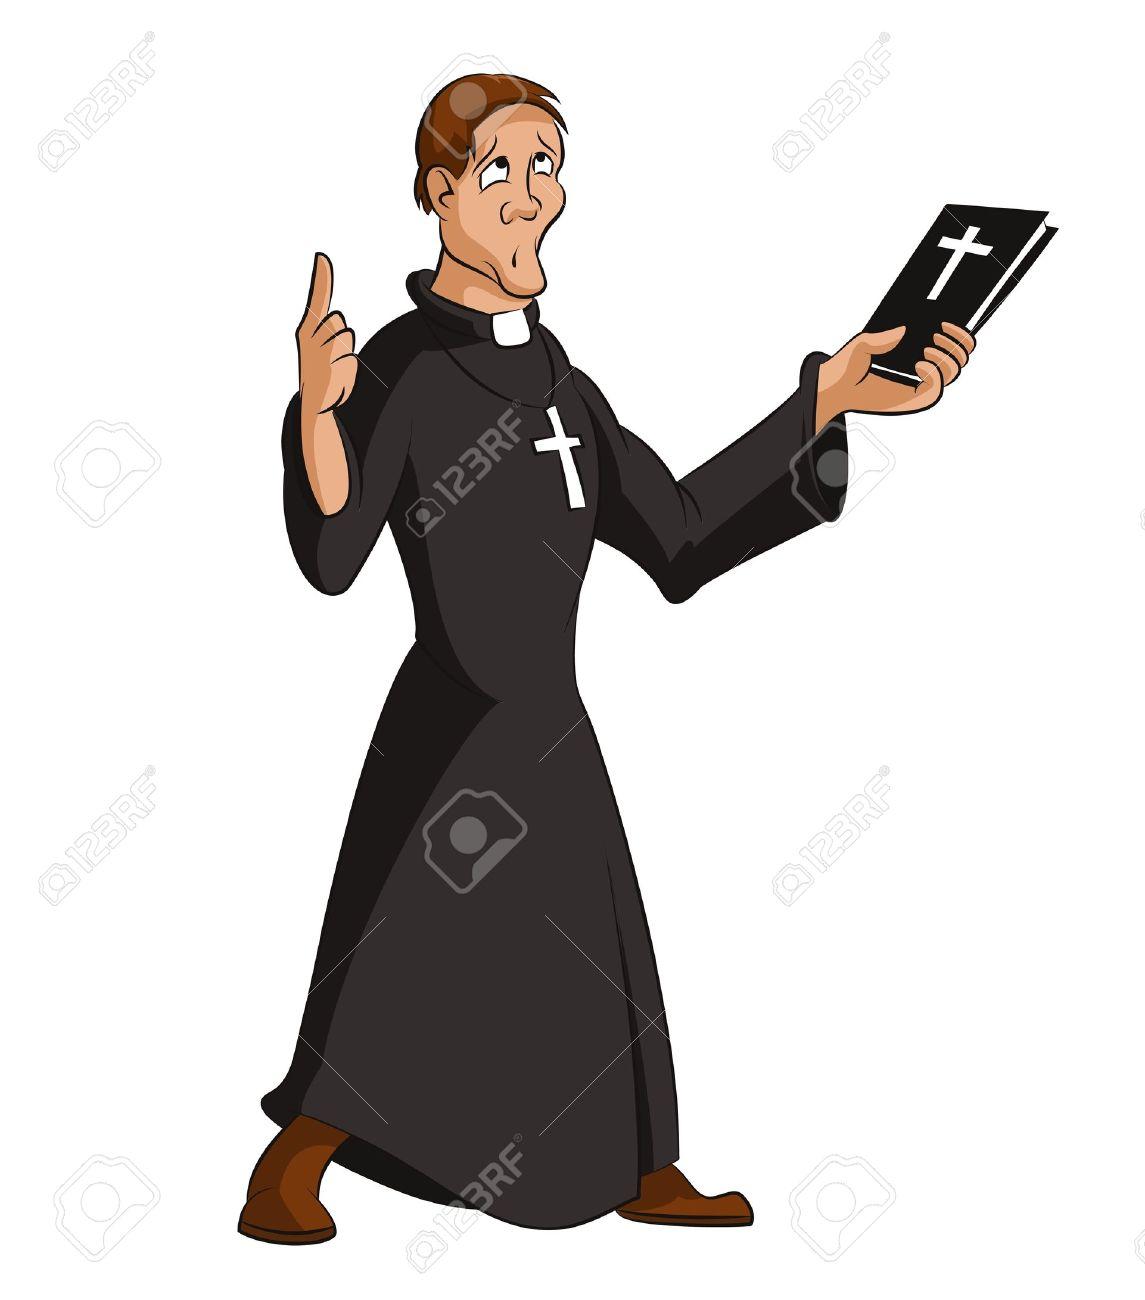 hight resolution of image of funny cartoon smart priest